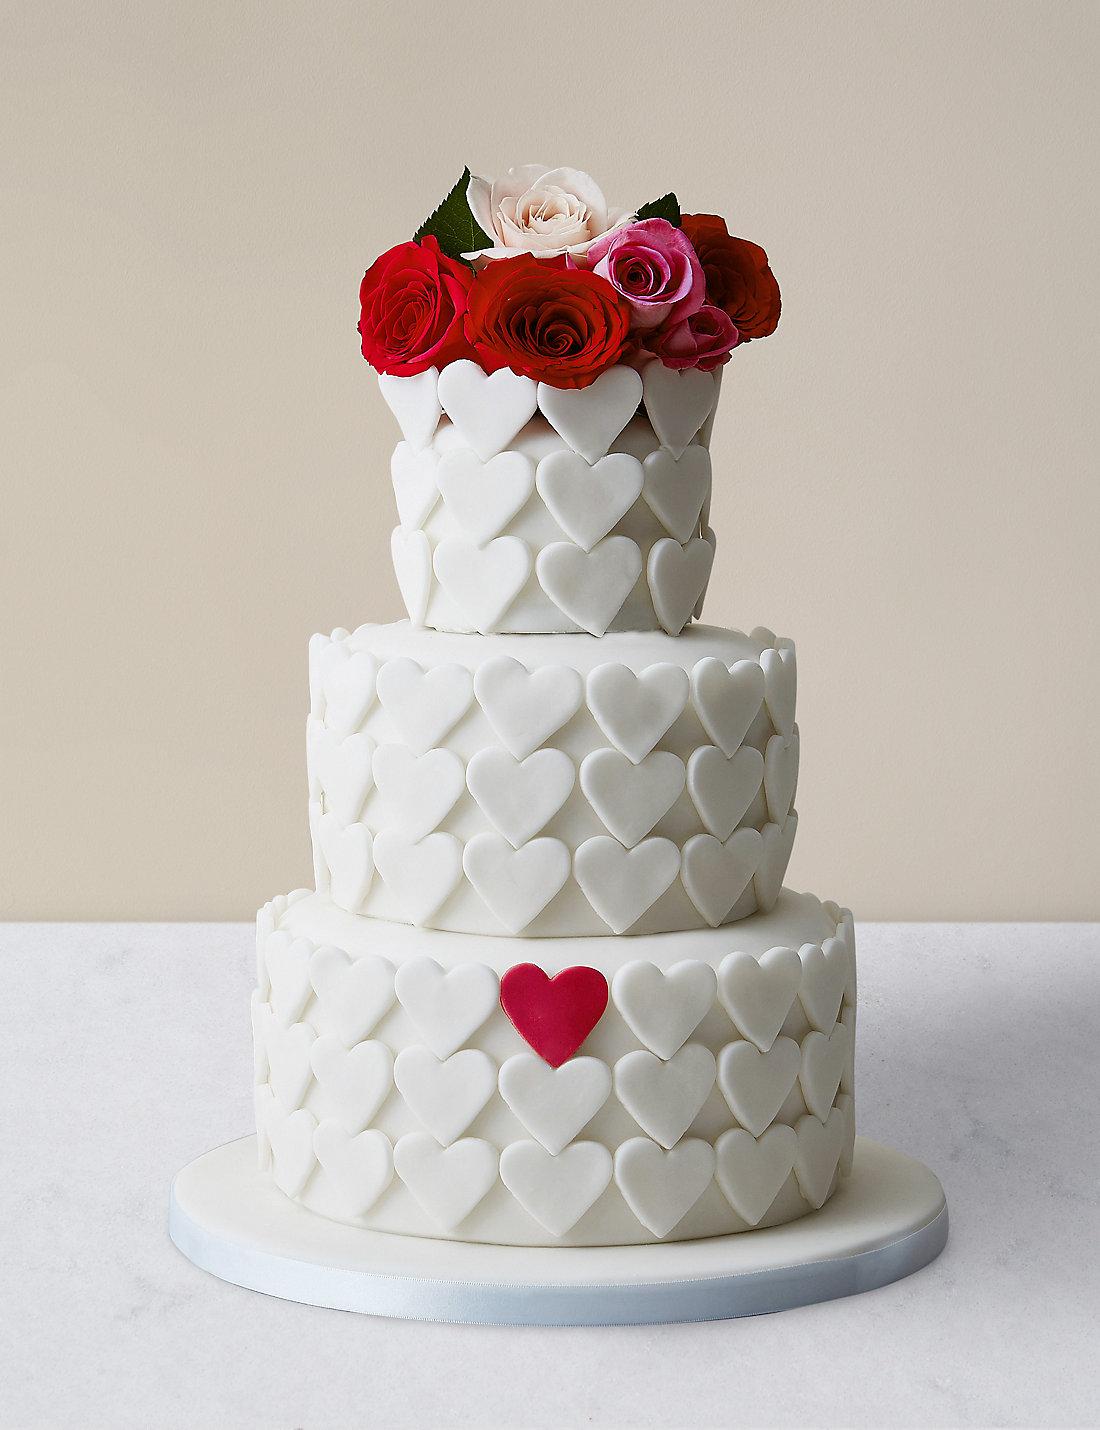 Serene Heart Chocolate Sponge Wedding Cake